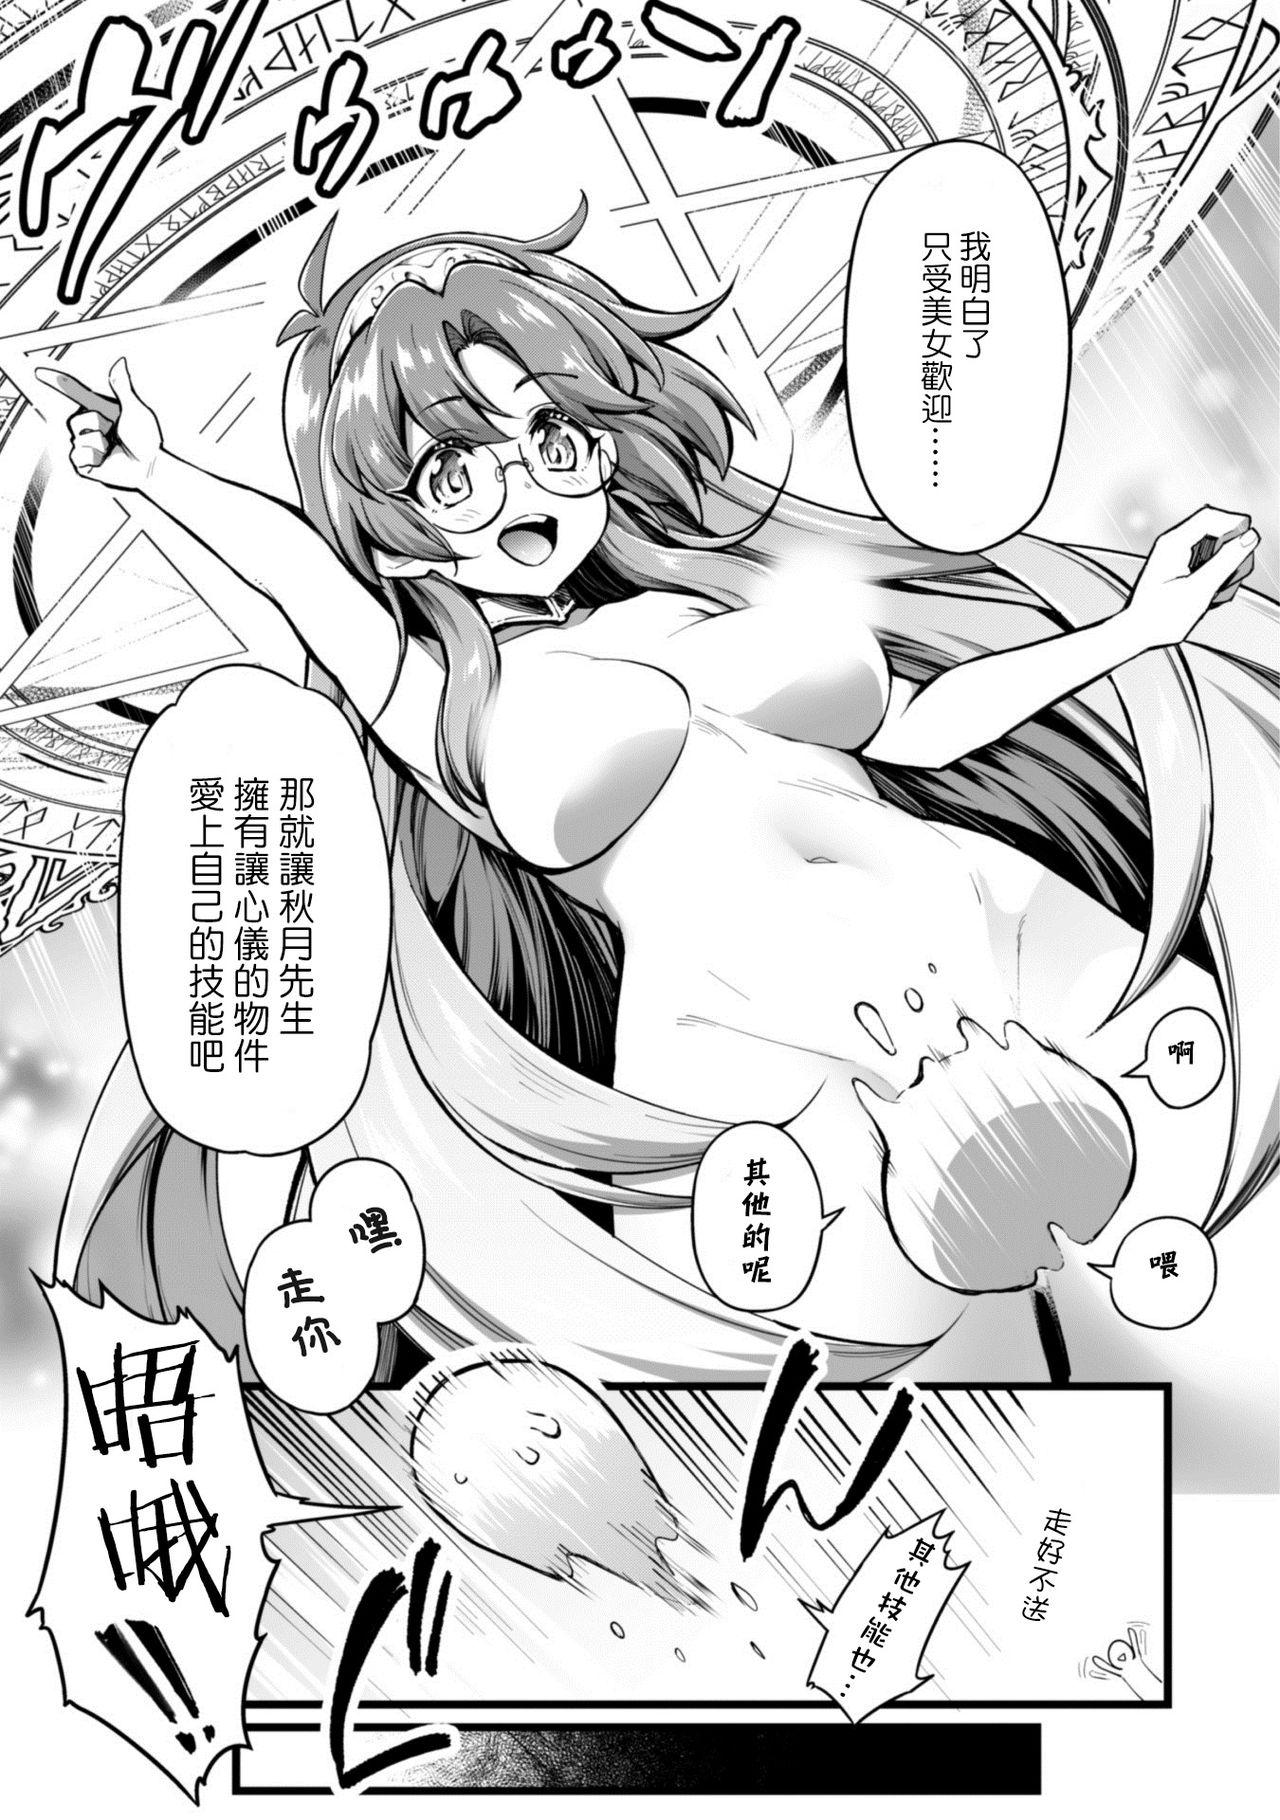 Eroi Skill de Isekai Musou Ch. 1 25